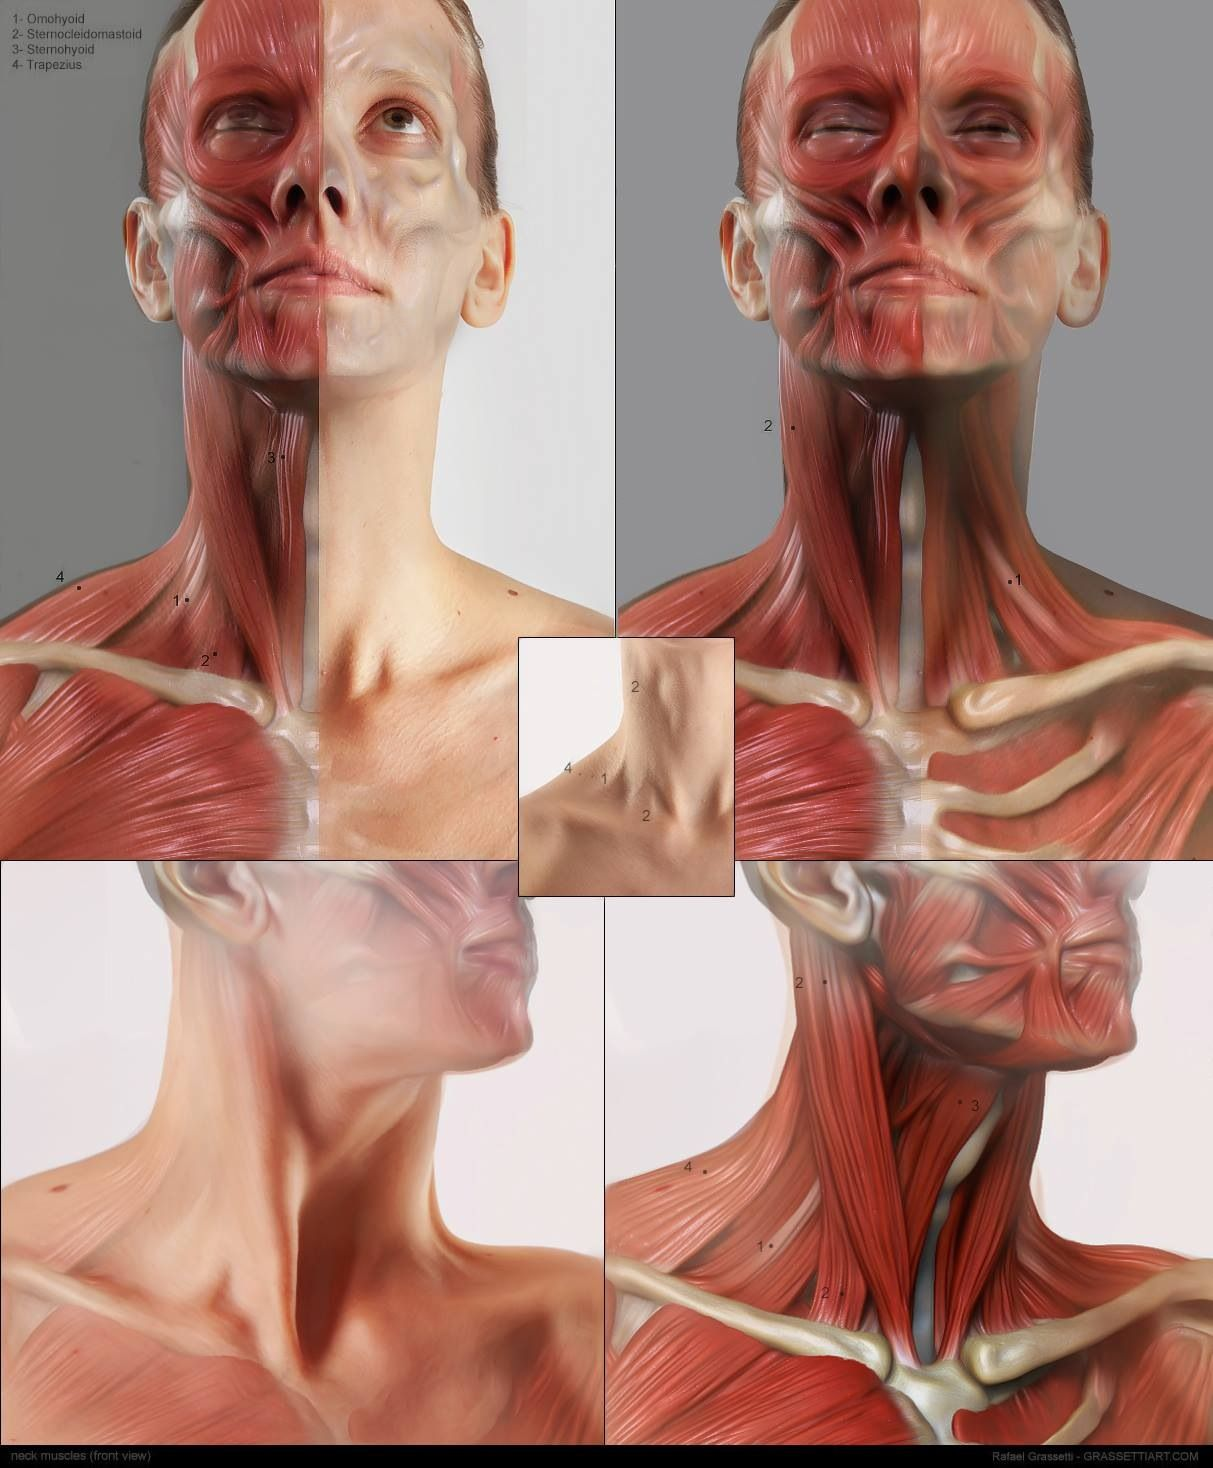 Anatomía, músculos, cuello | Human Anatomy | Pinterest | Human ...